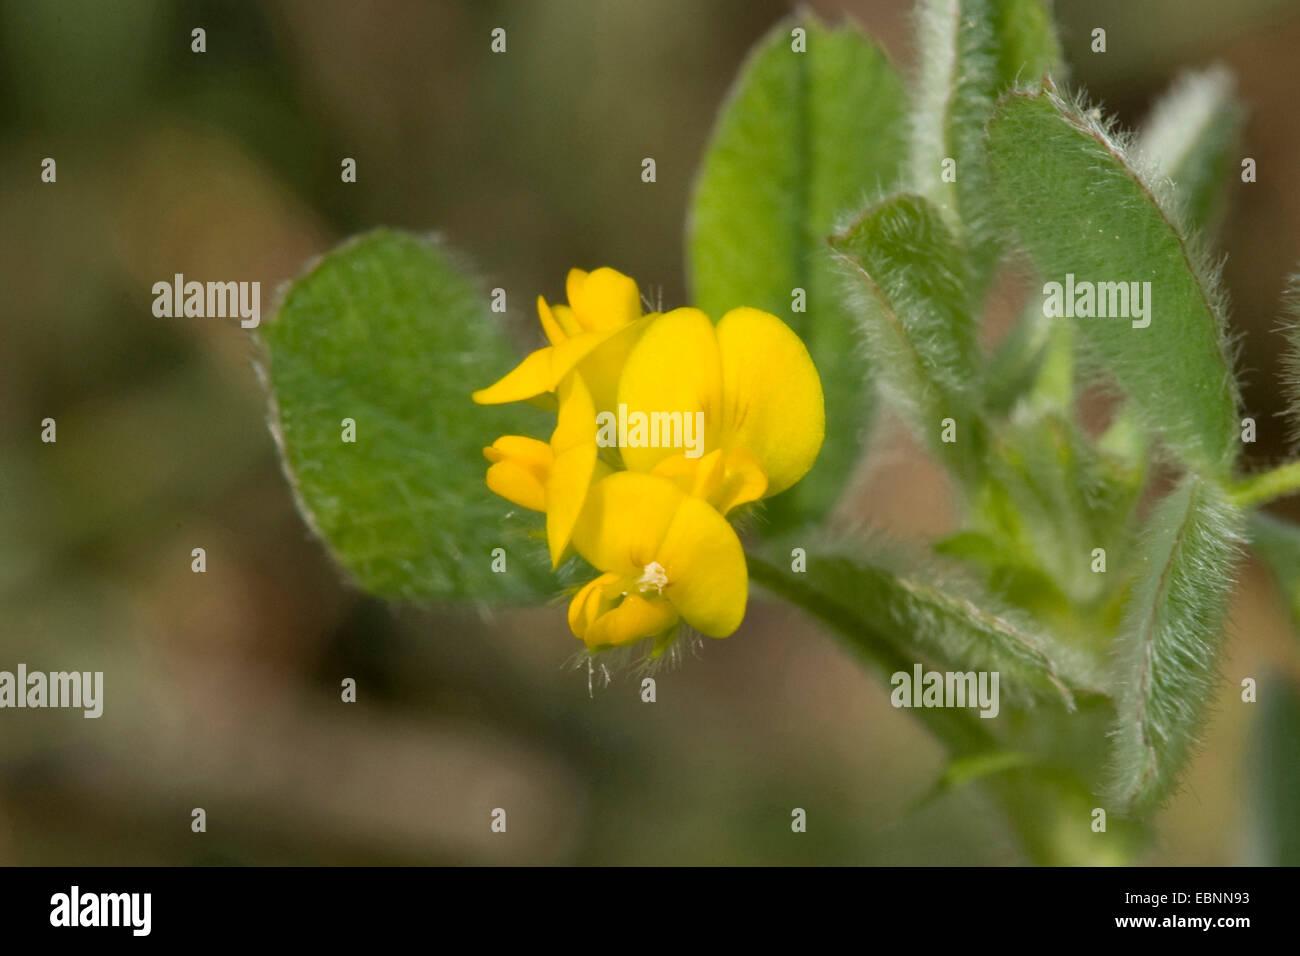 Bur medick, Little burclover (Medicago minima), blooming, Germany - Stock Image